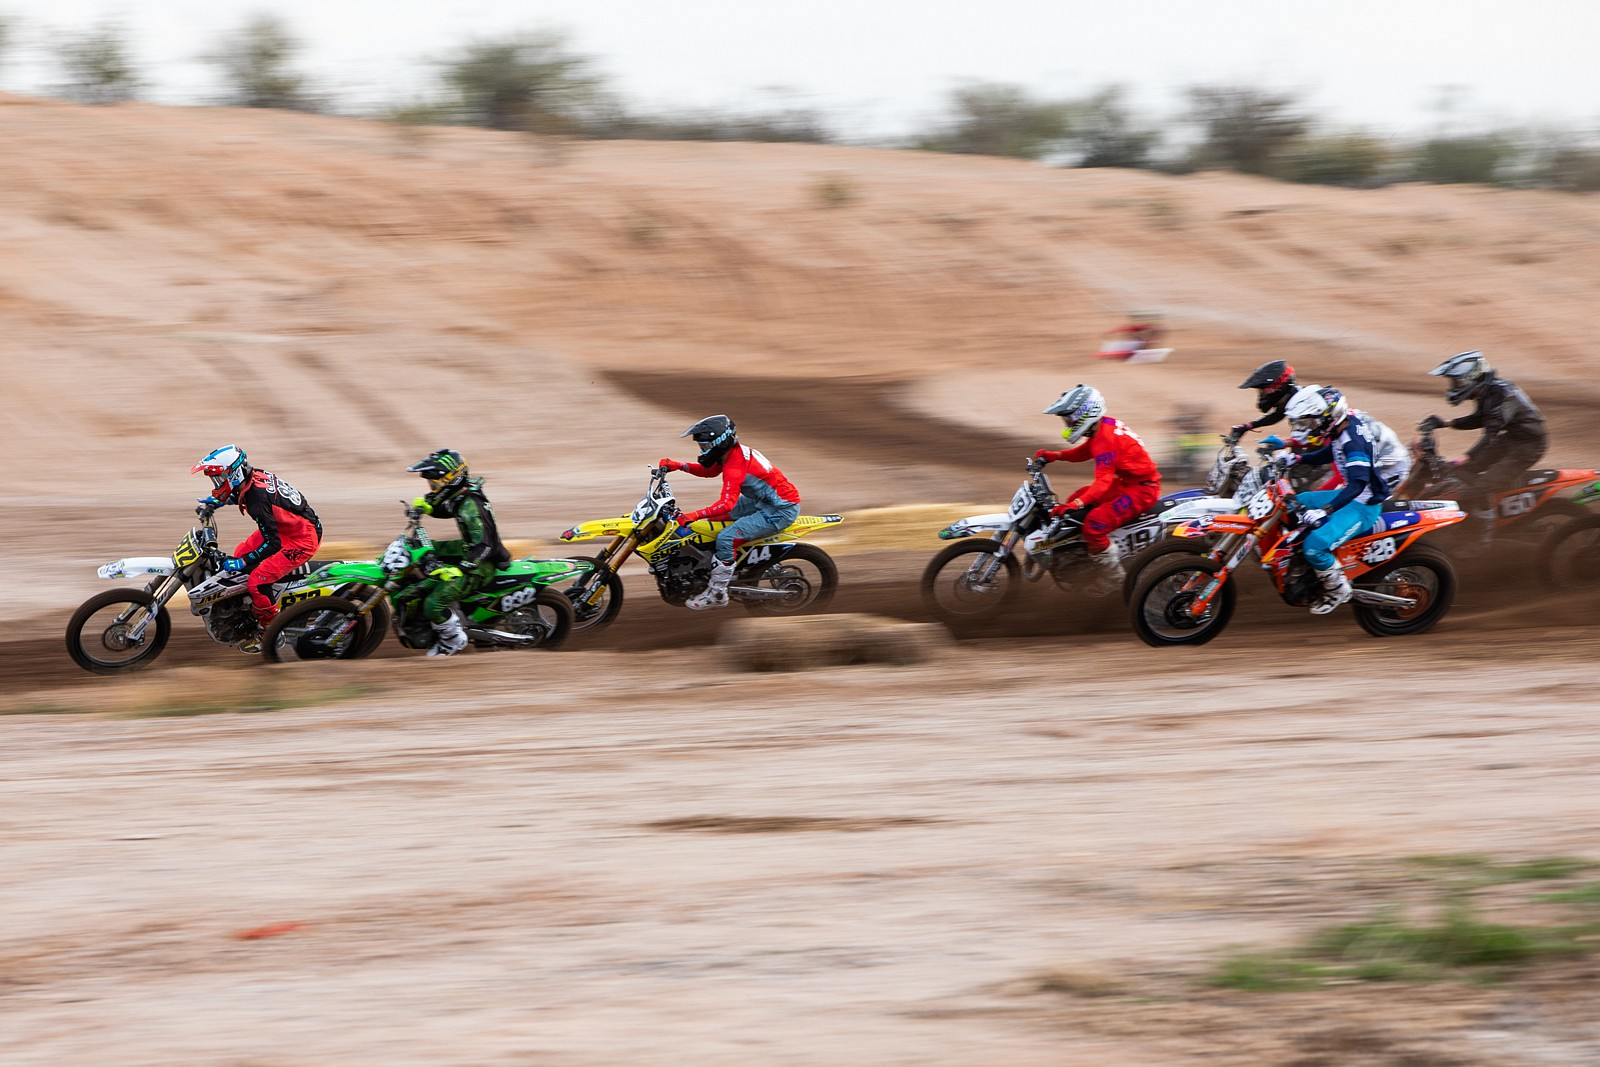 20-minute motos - AZ Open of Motocross, Part 2 - Motocross Pictures - Vital MX